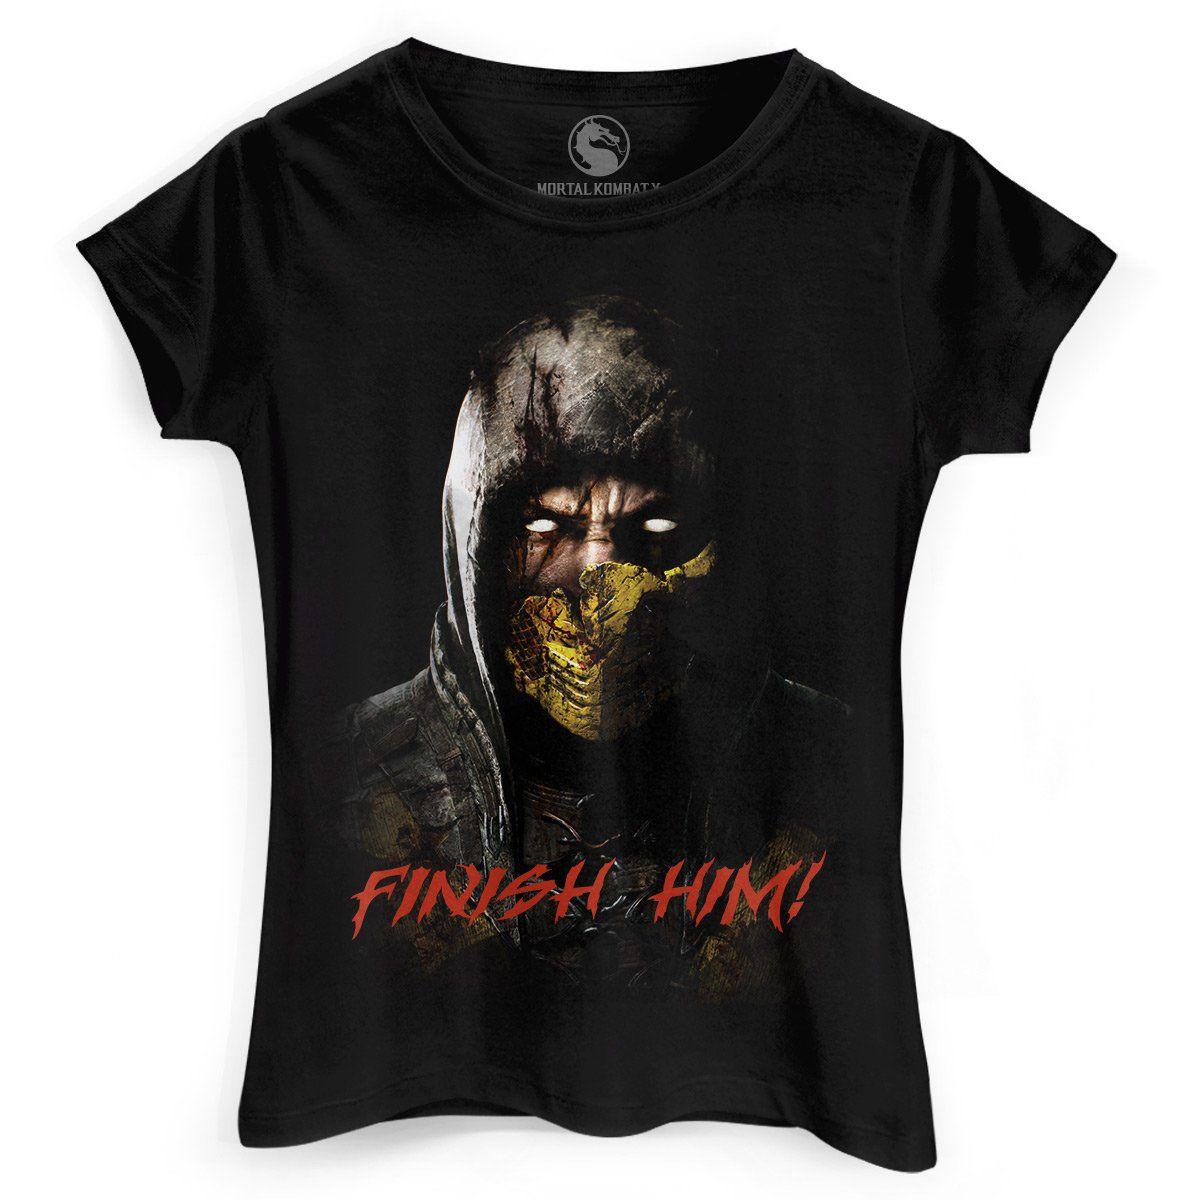 Camiseta Feminina Mortal Kombat X Finish Him  - bandUP Store Marketplace